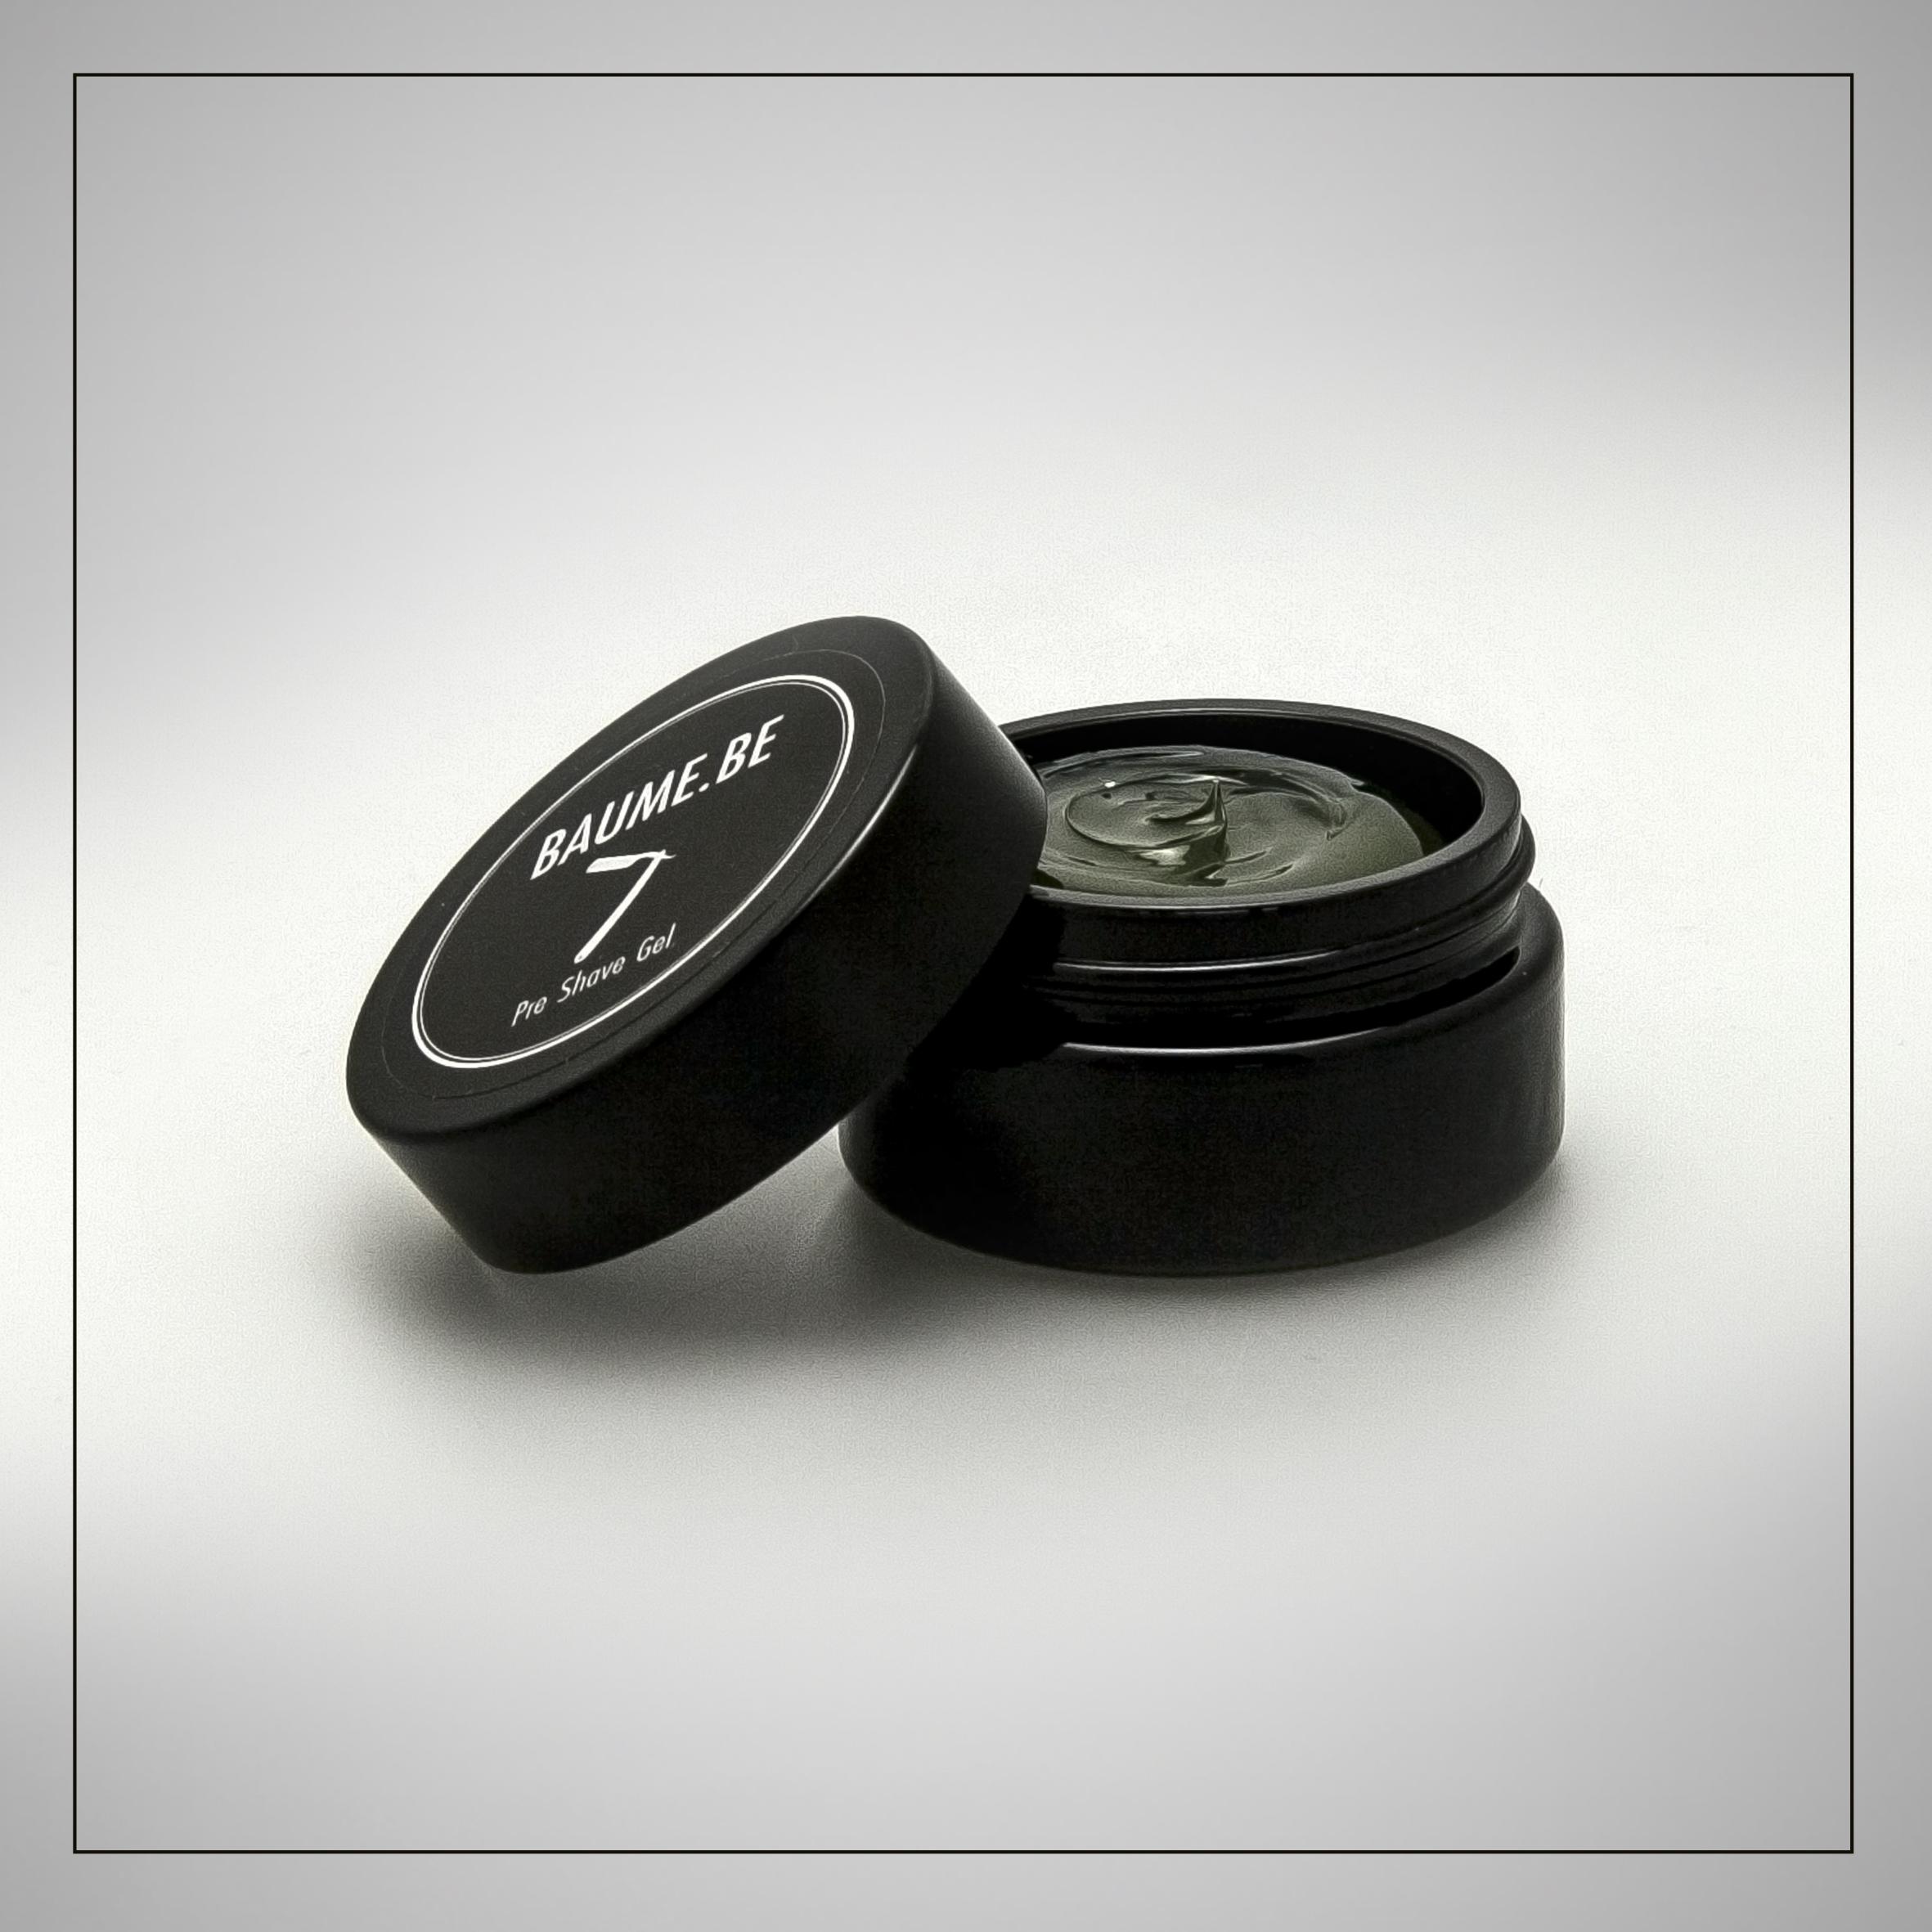 Pre Shave gel